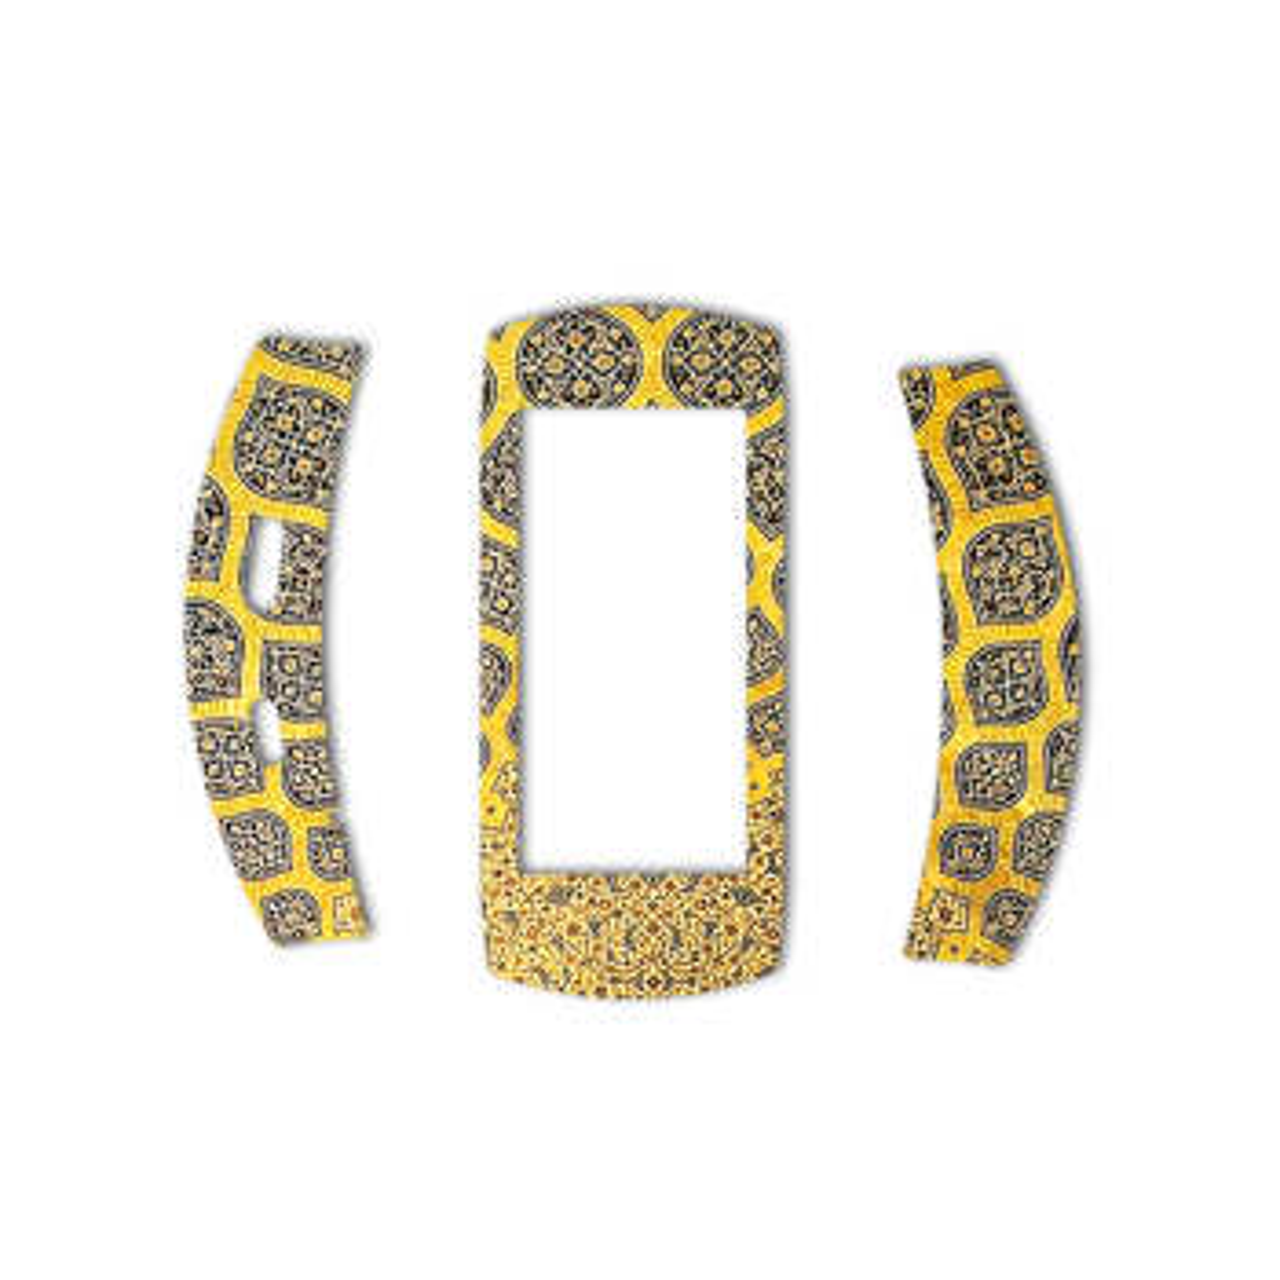 برچسب ماهوت مدل Sheikh Lotfollah Mosque-tile Design مناسب برای ساعت هوشمند Samsung Gear Fit 2 Pro